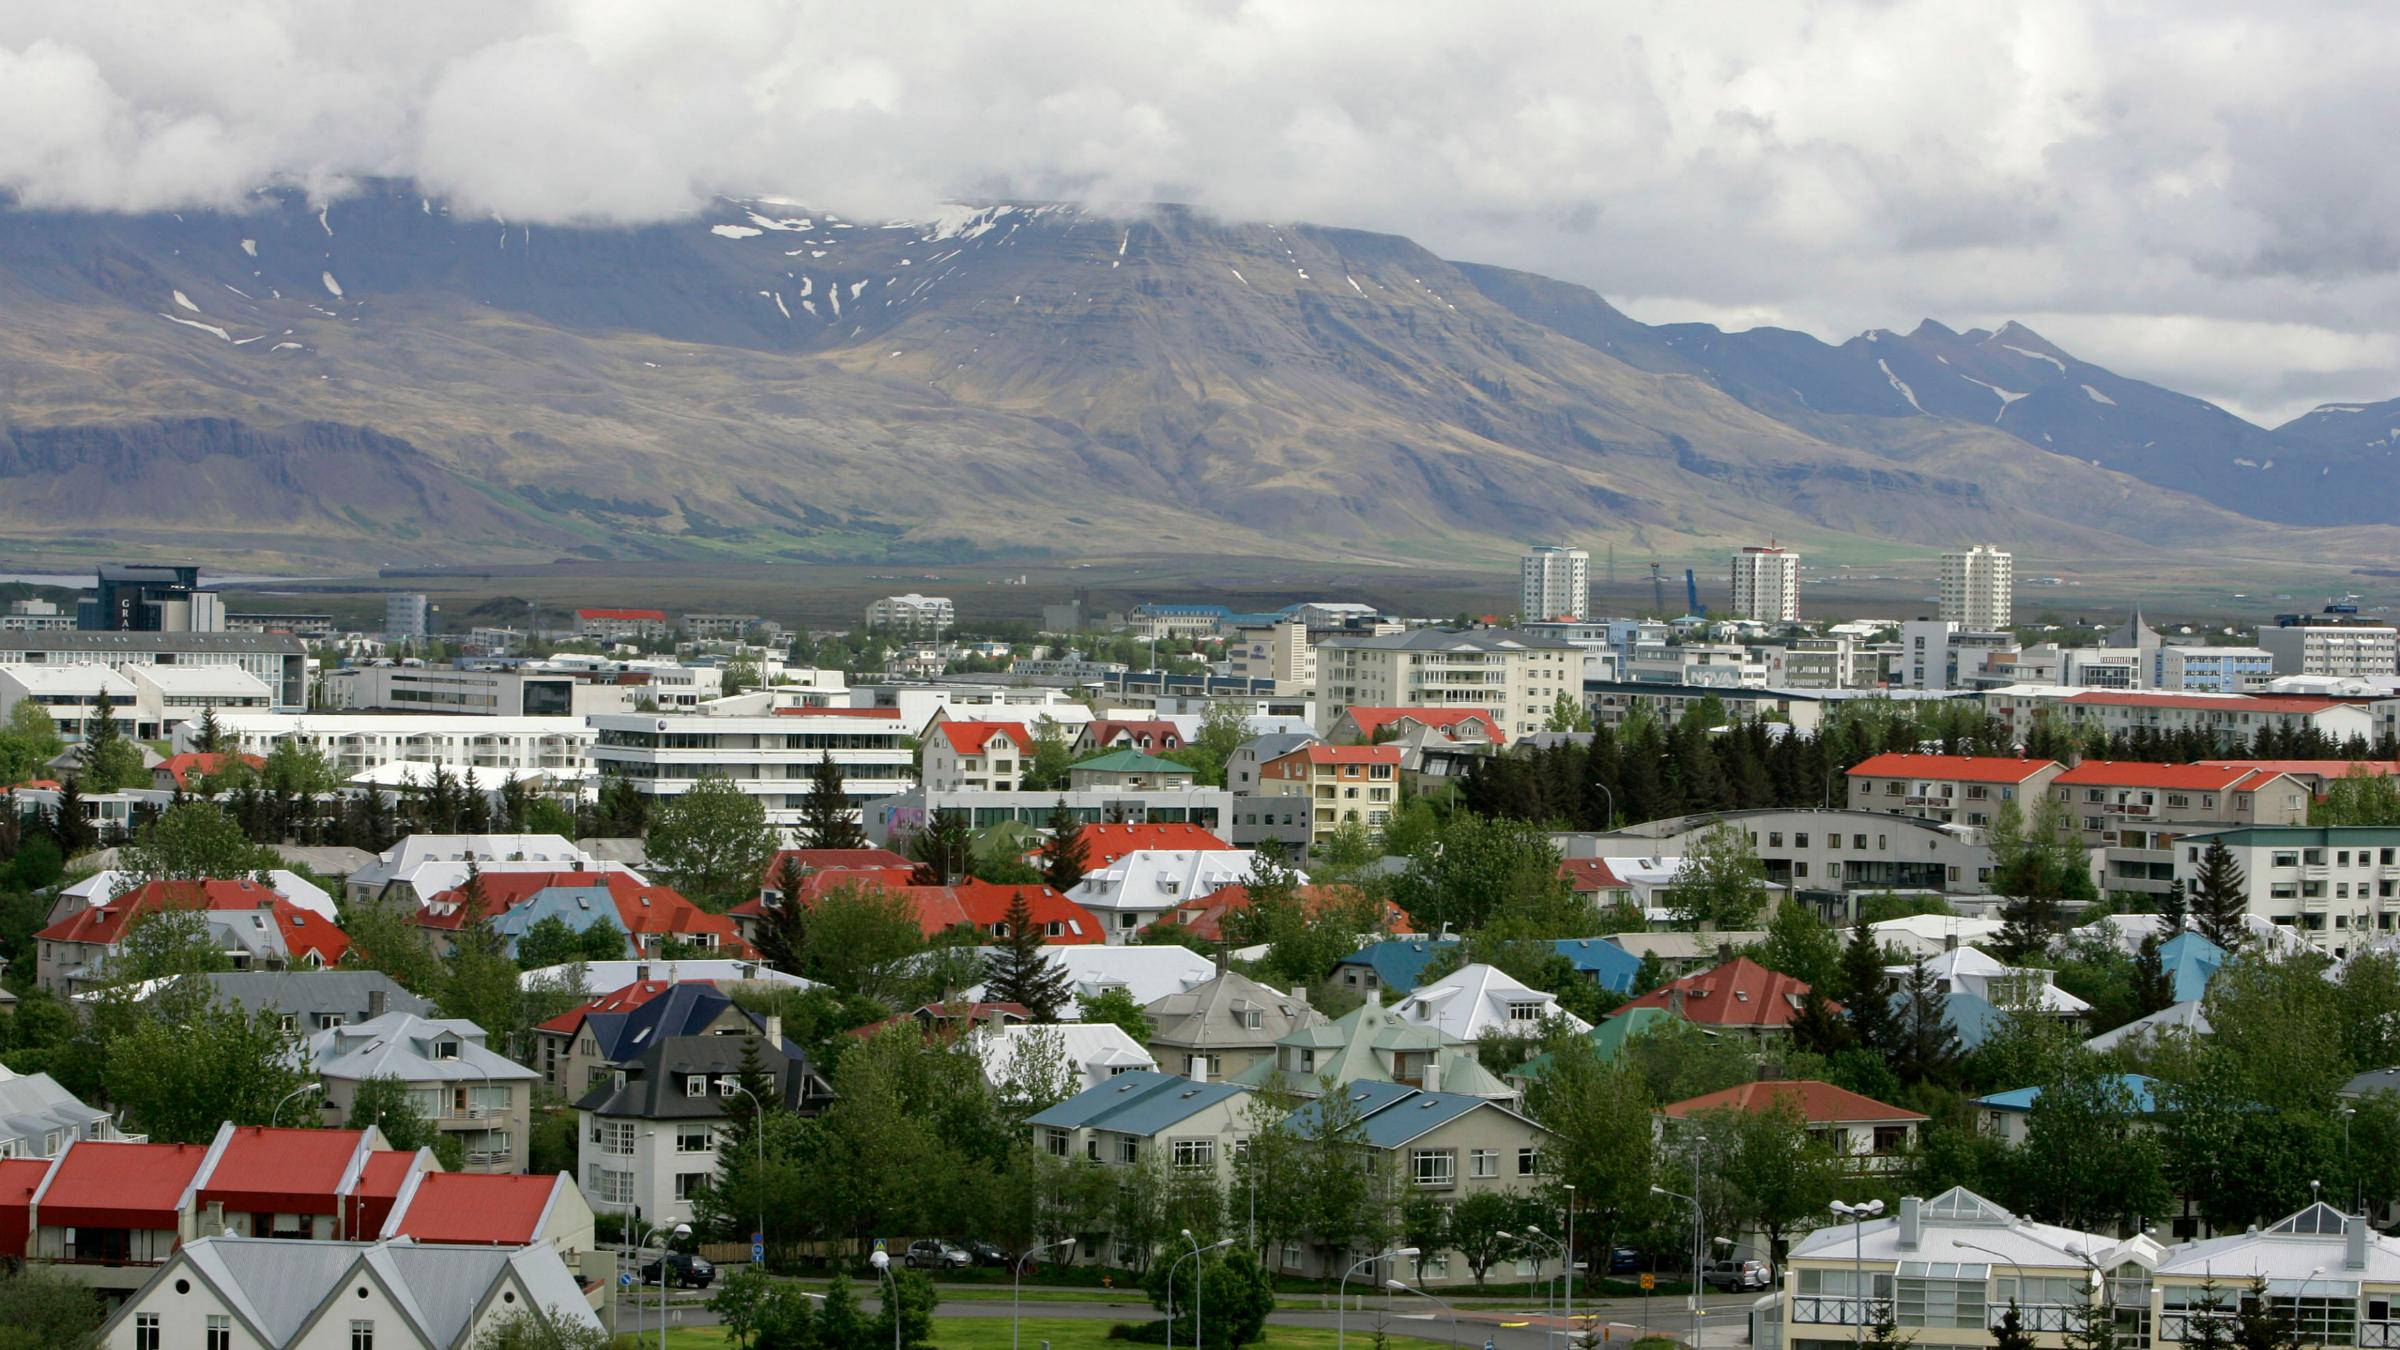 View across Reykjavík in Iceland from Öskjuhlíd Hill.